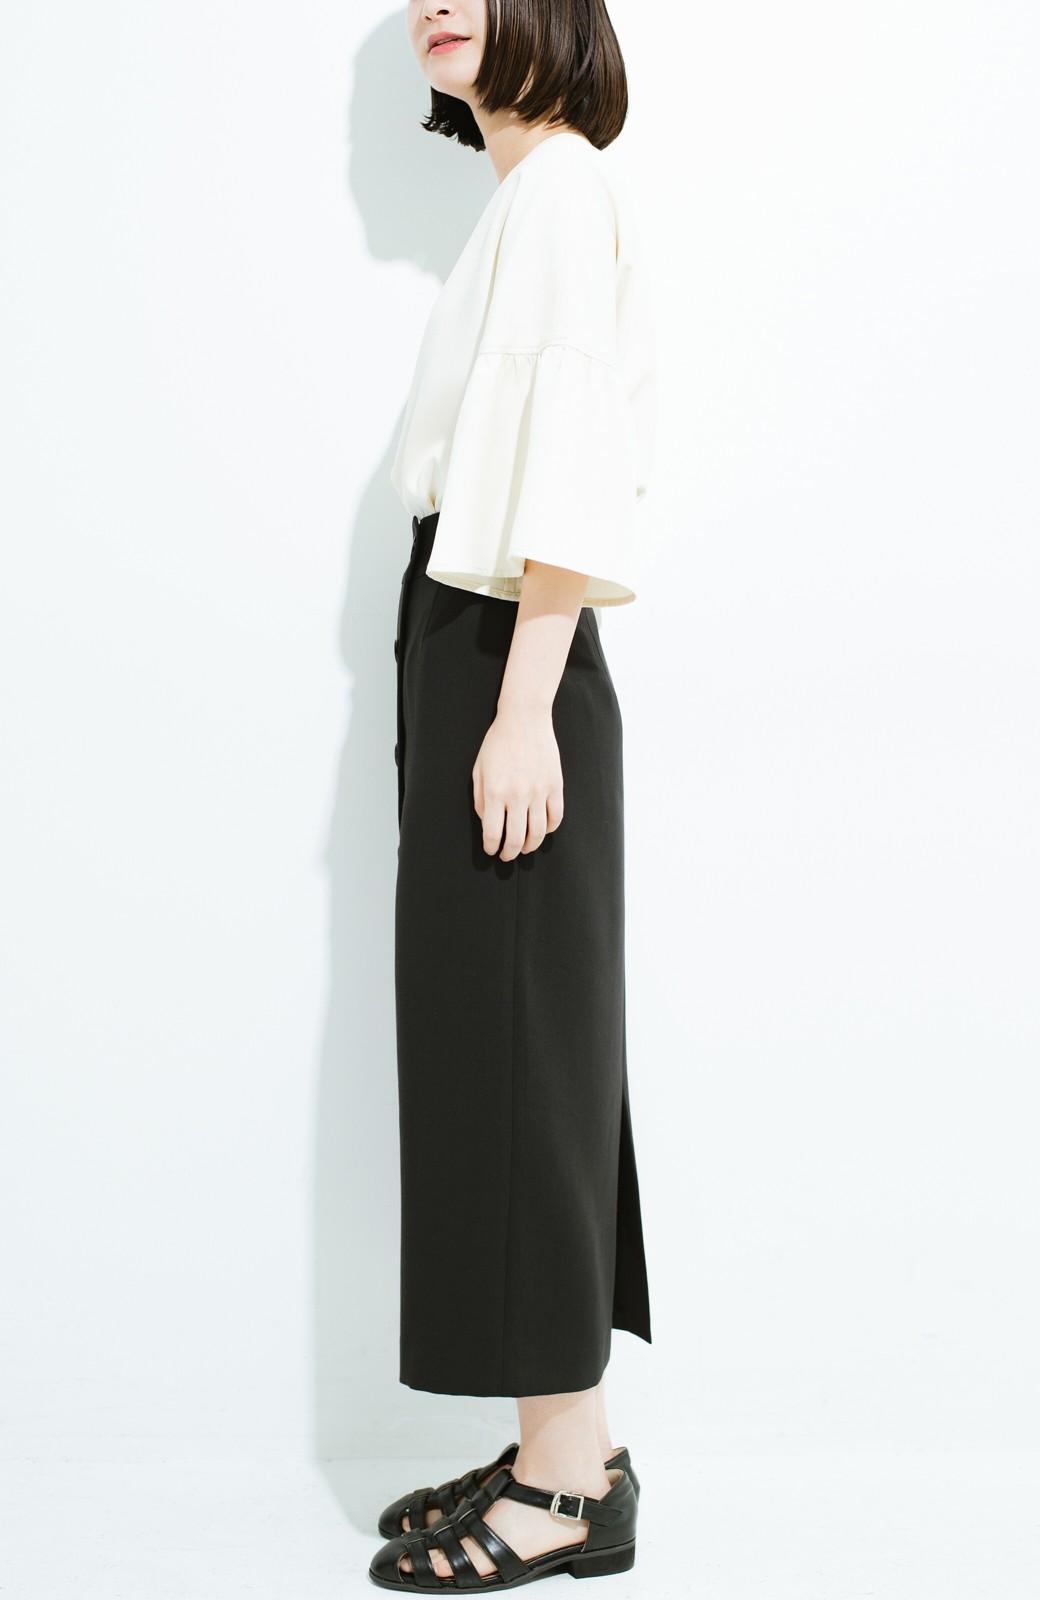 haco! はいてこそ見える実力、セミフォーマルにも使えるオトナのタイトスカート by MAKORI <ブラック>の商品写真4